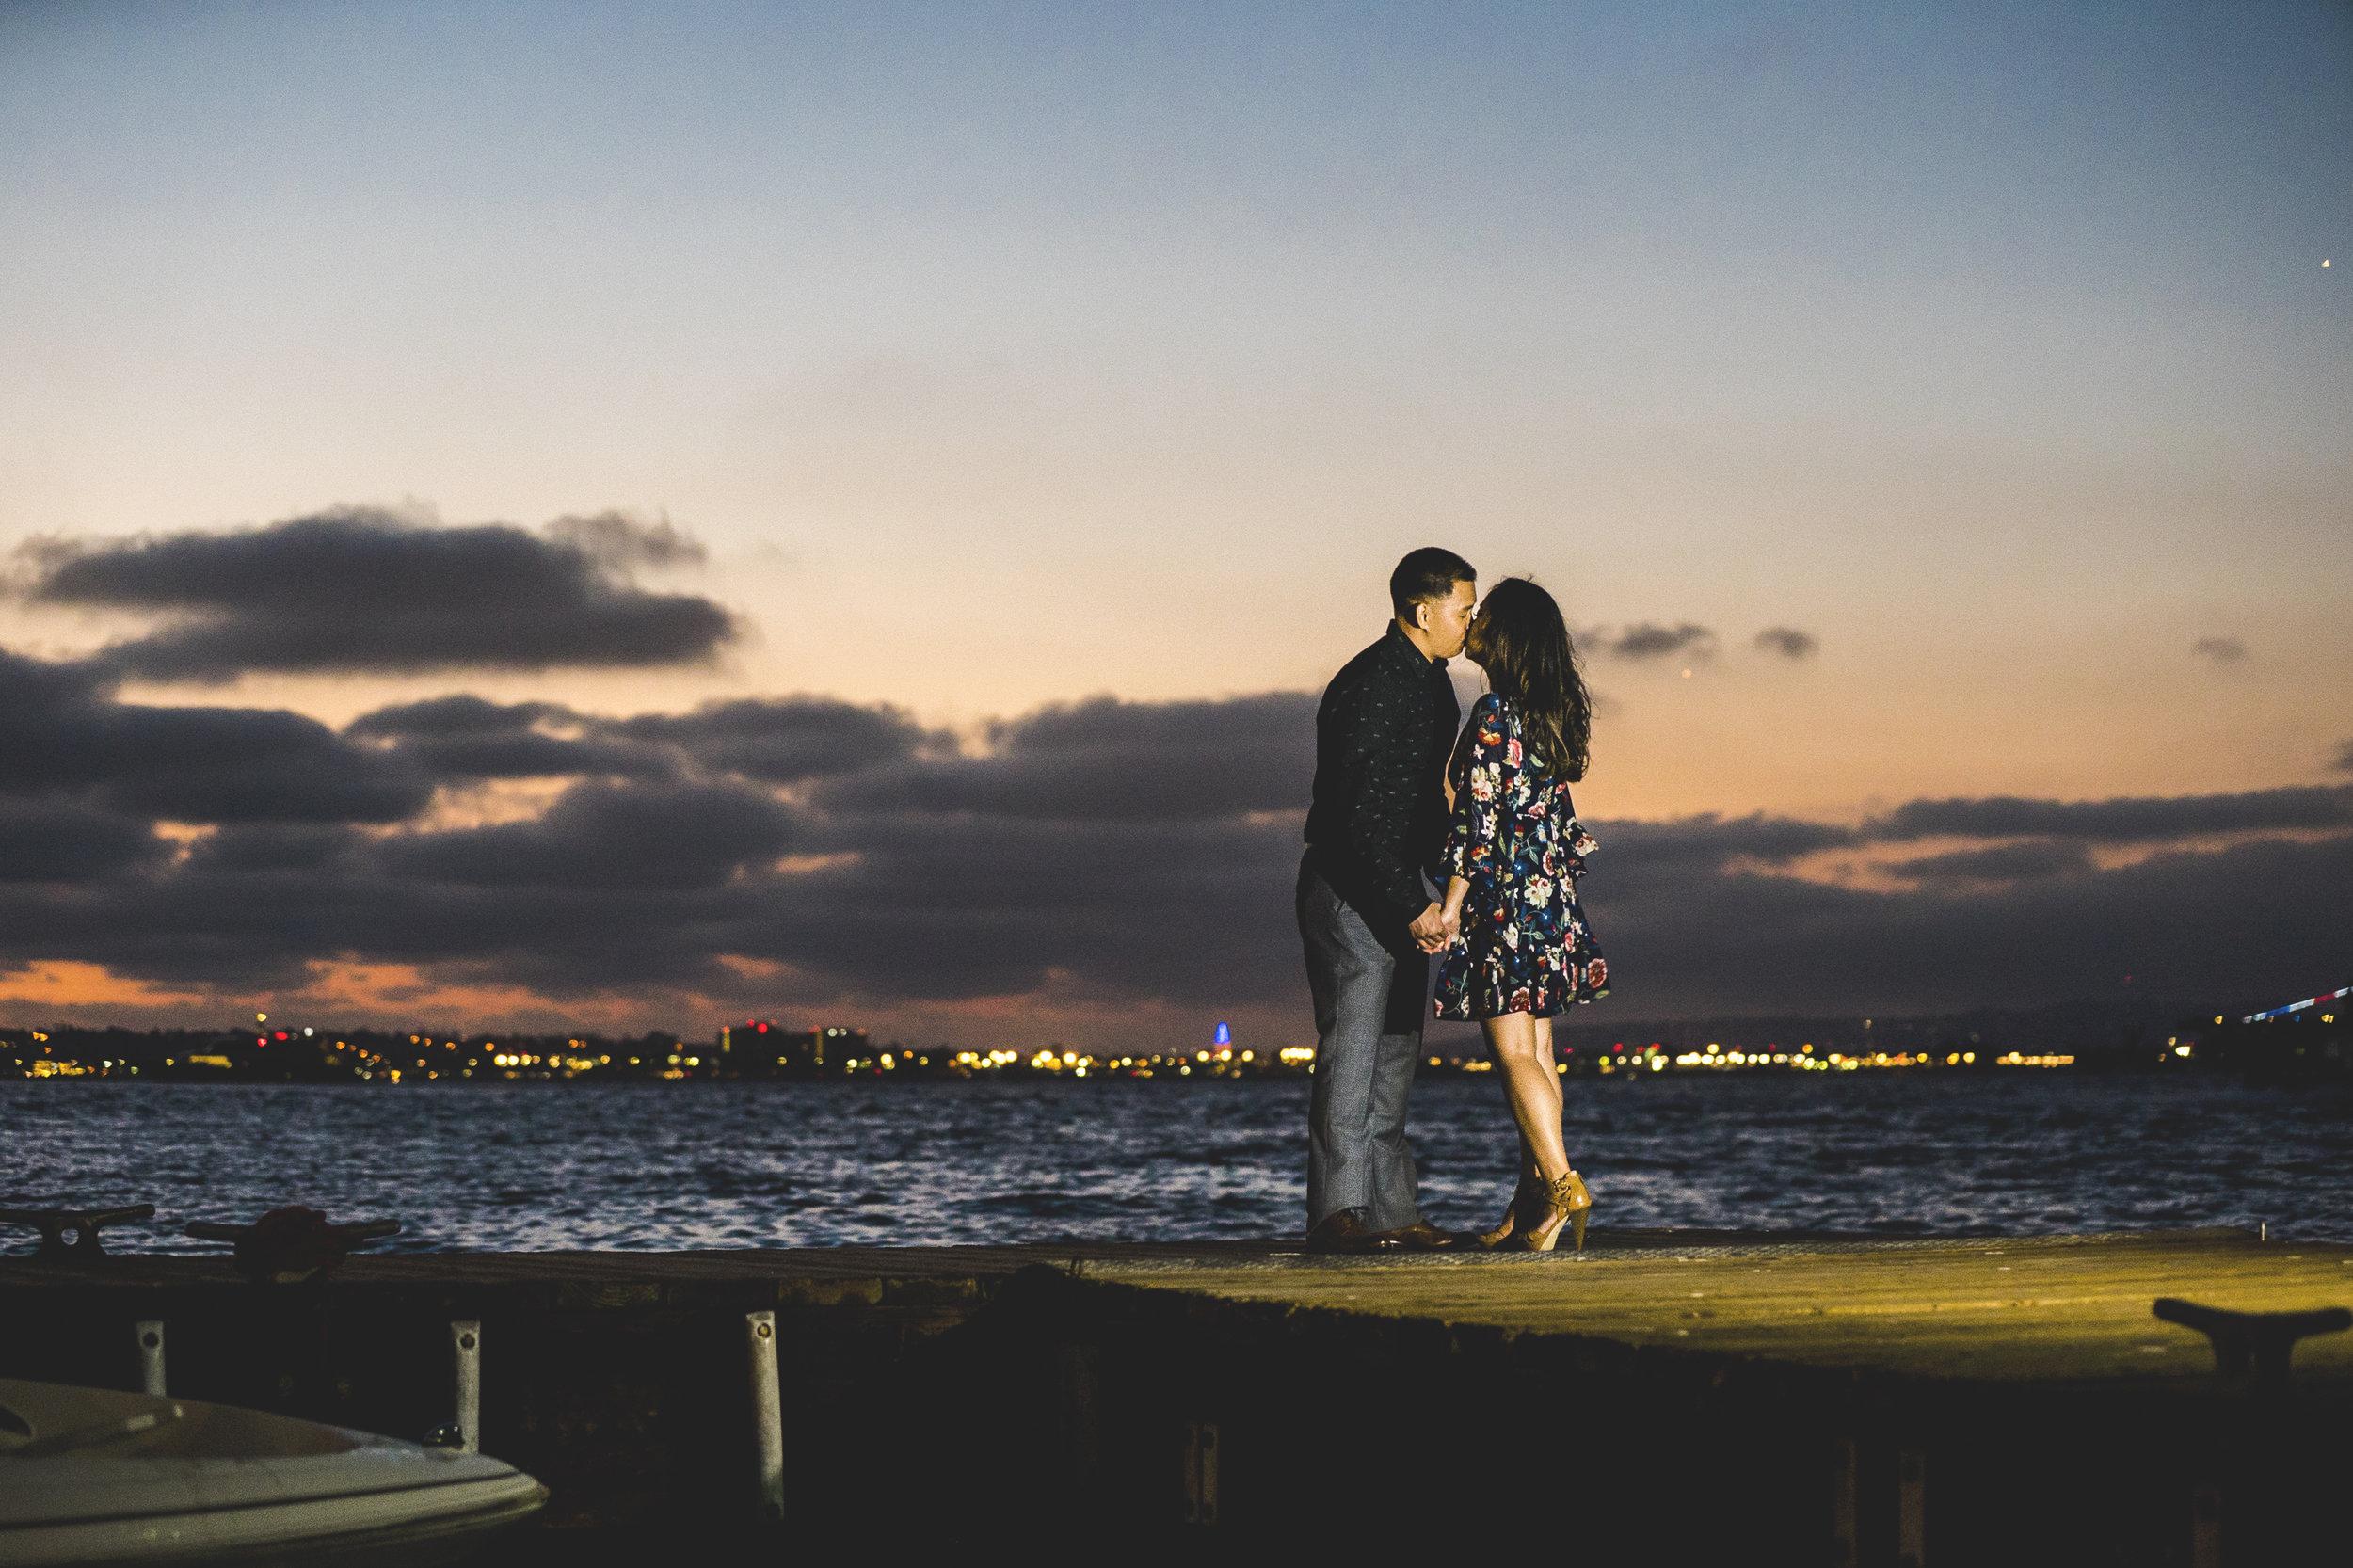 Desiree + Vinh Engagement Shoot (August.12.2016)_52.1.jpg